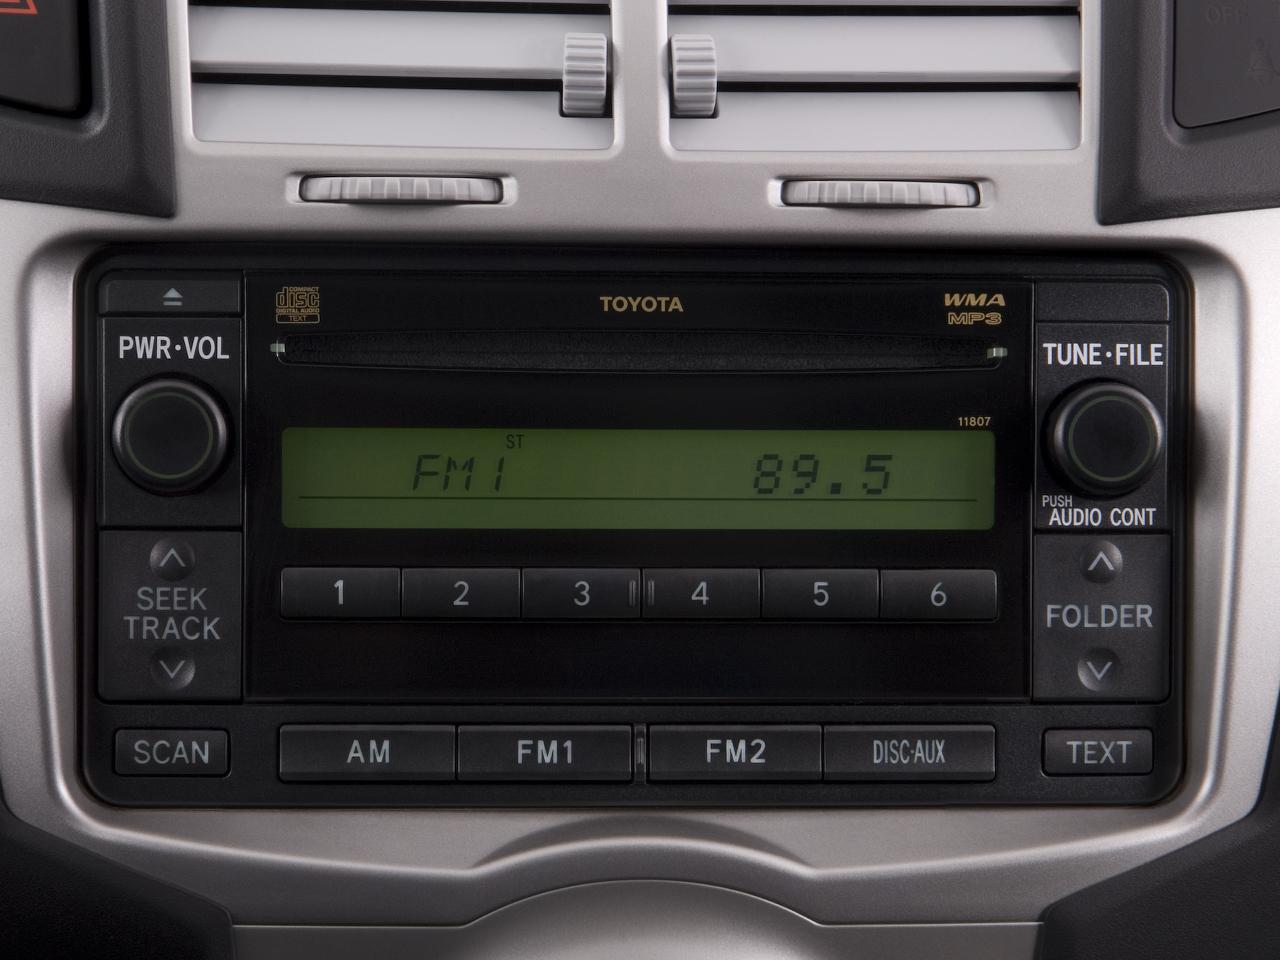 2008 Toyota Yaris Toyota Compact Sedan Review